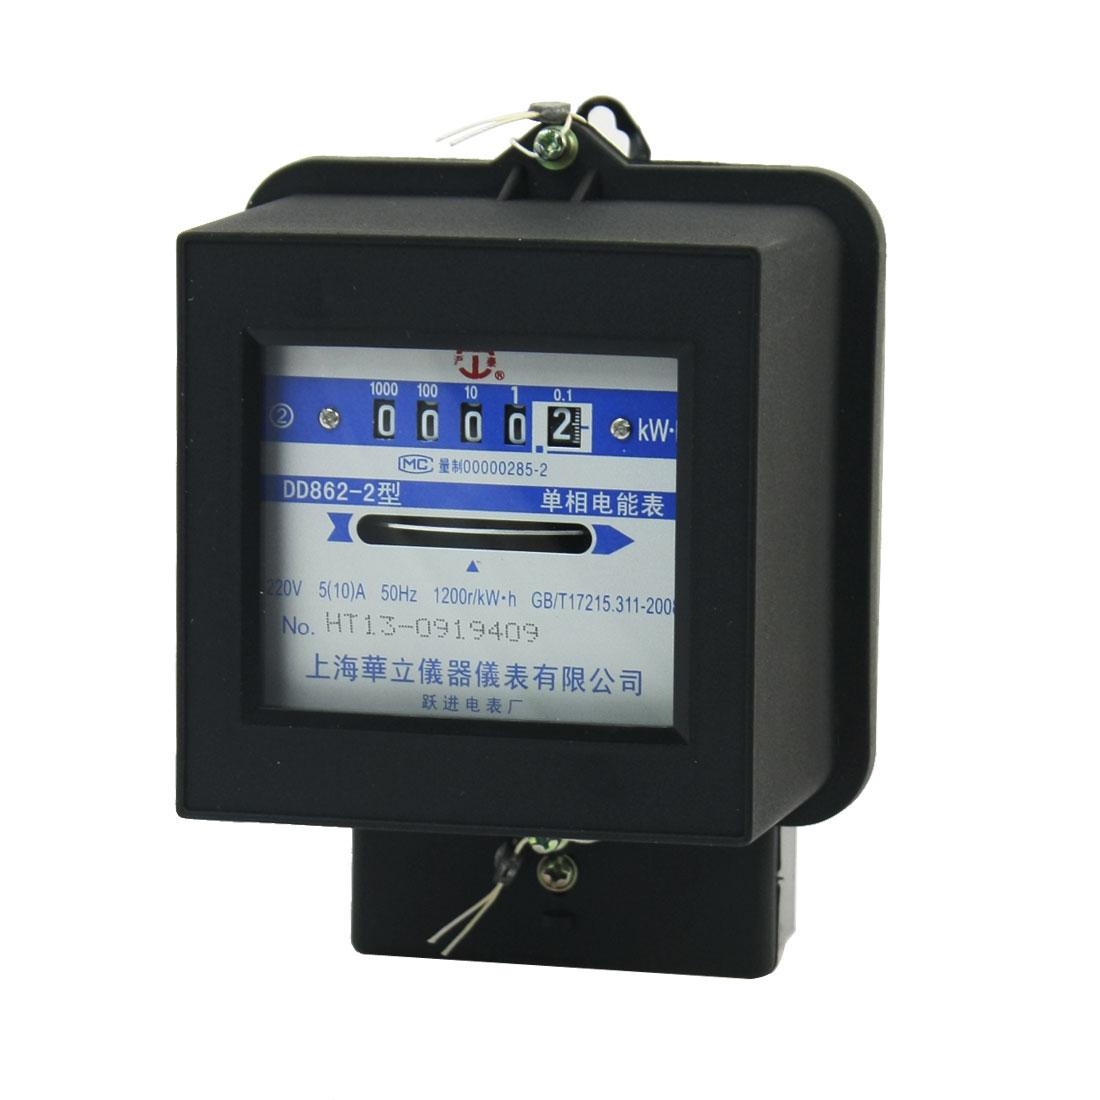 DD862-2 Wall Mounting 0-9999.9 5-Digits One Phase Kilowatt Hour Watt-Hour Energy Meter AC 220V 5A